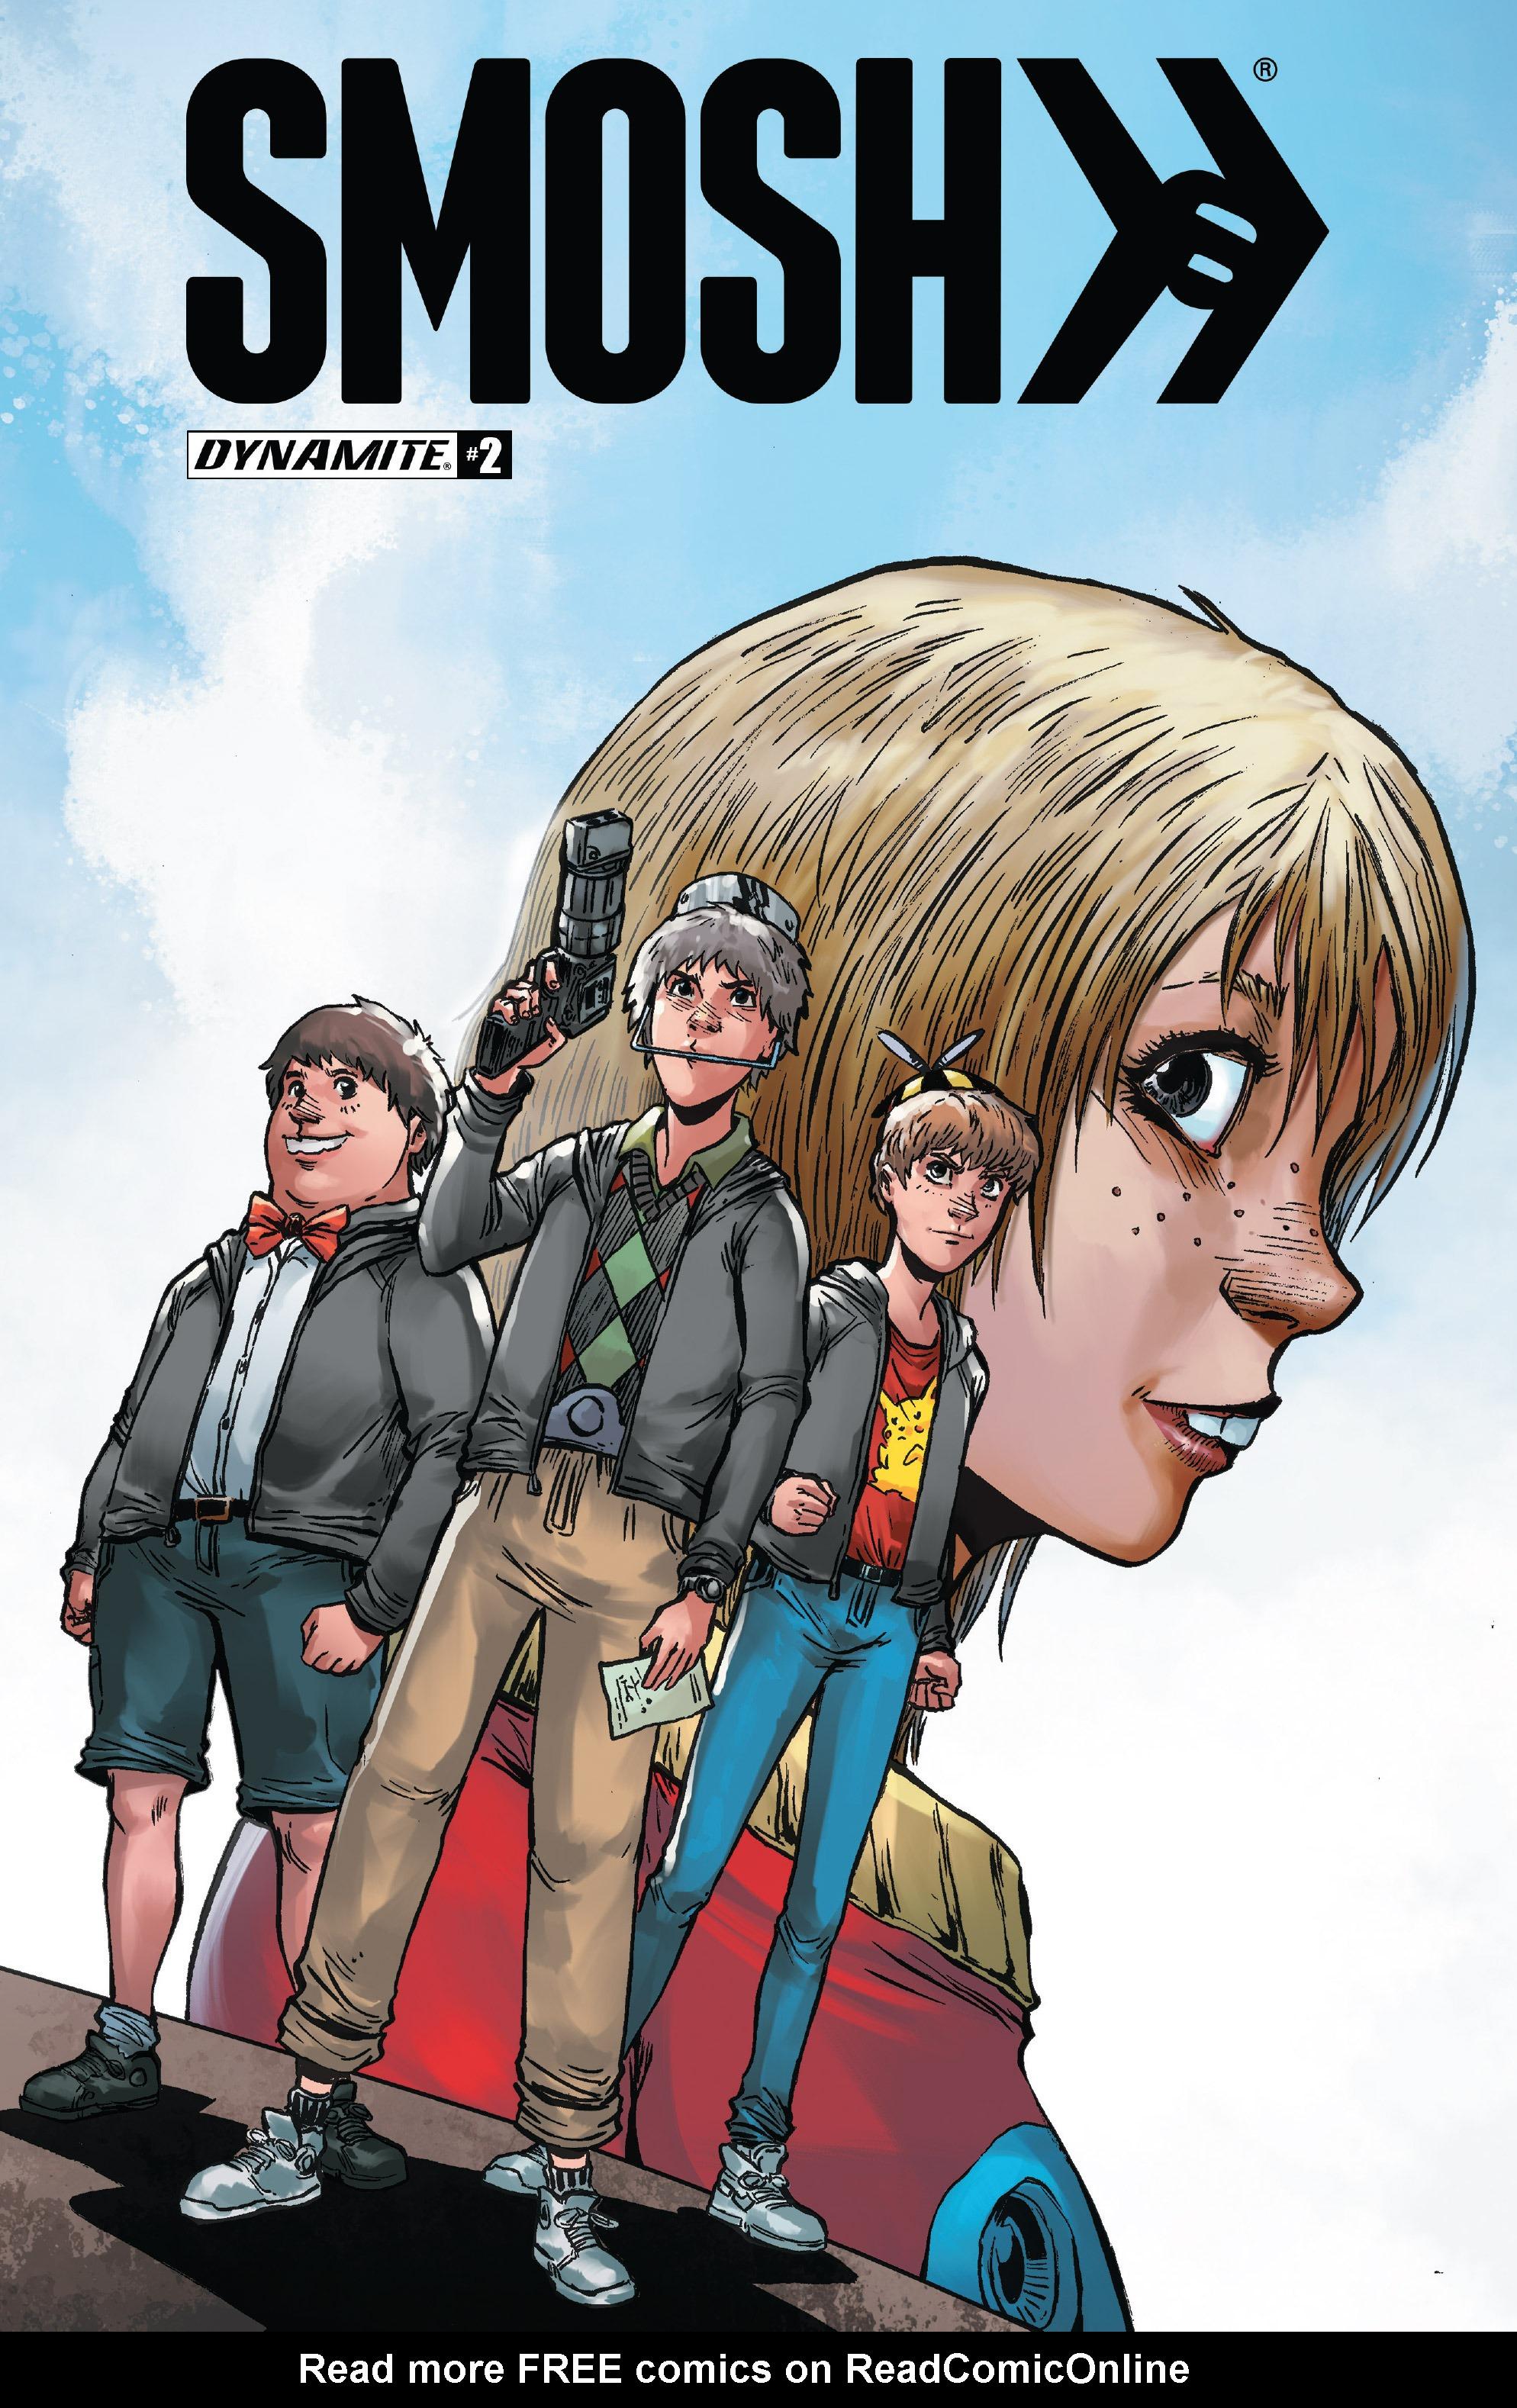 Read online Smosh comic -  Issue #2 - 1